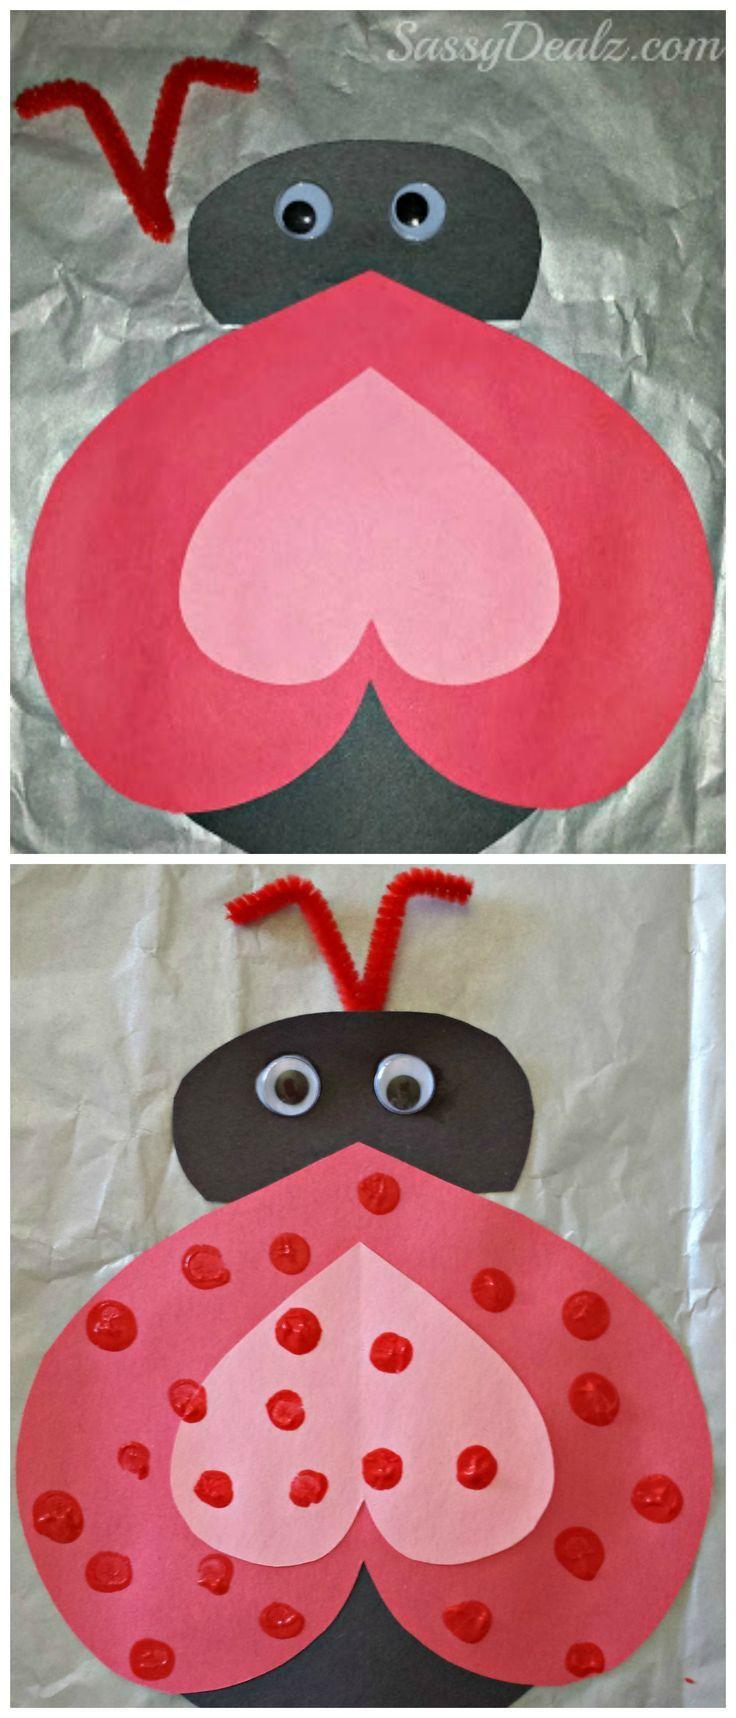 Heart Ladybug Valentines Day Card Craft For Kids DIY Valentines